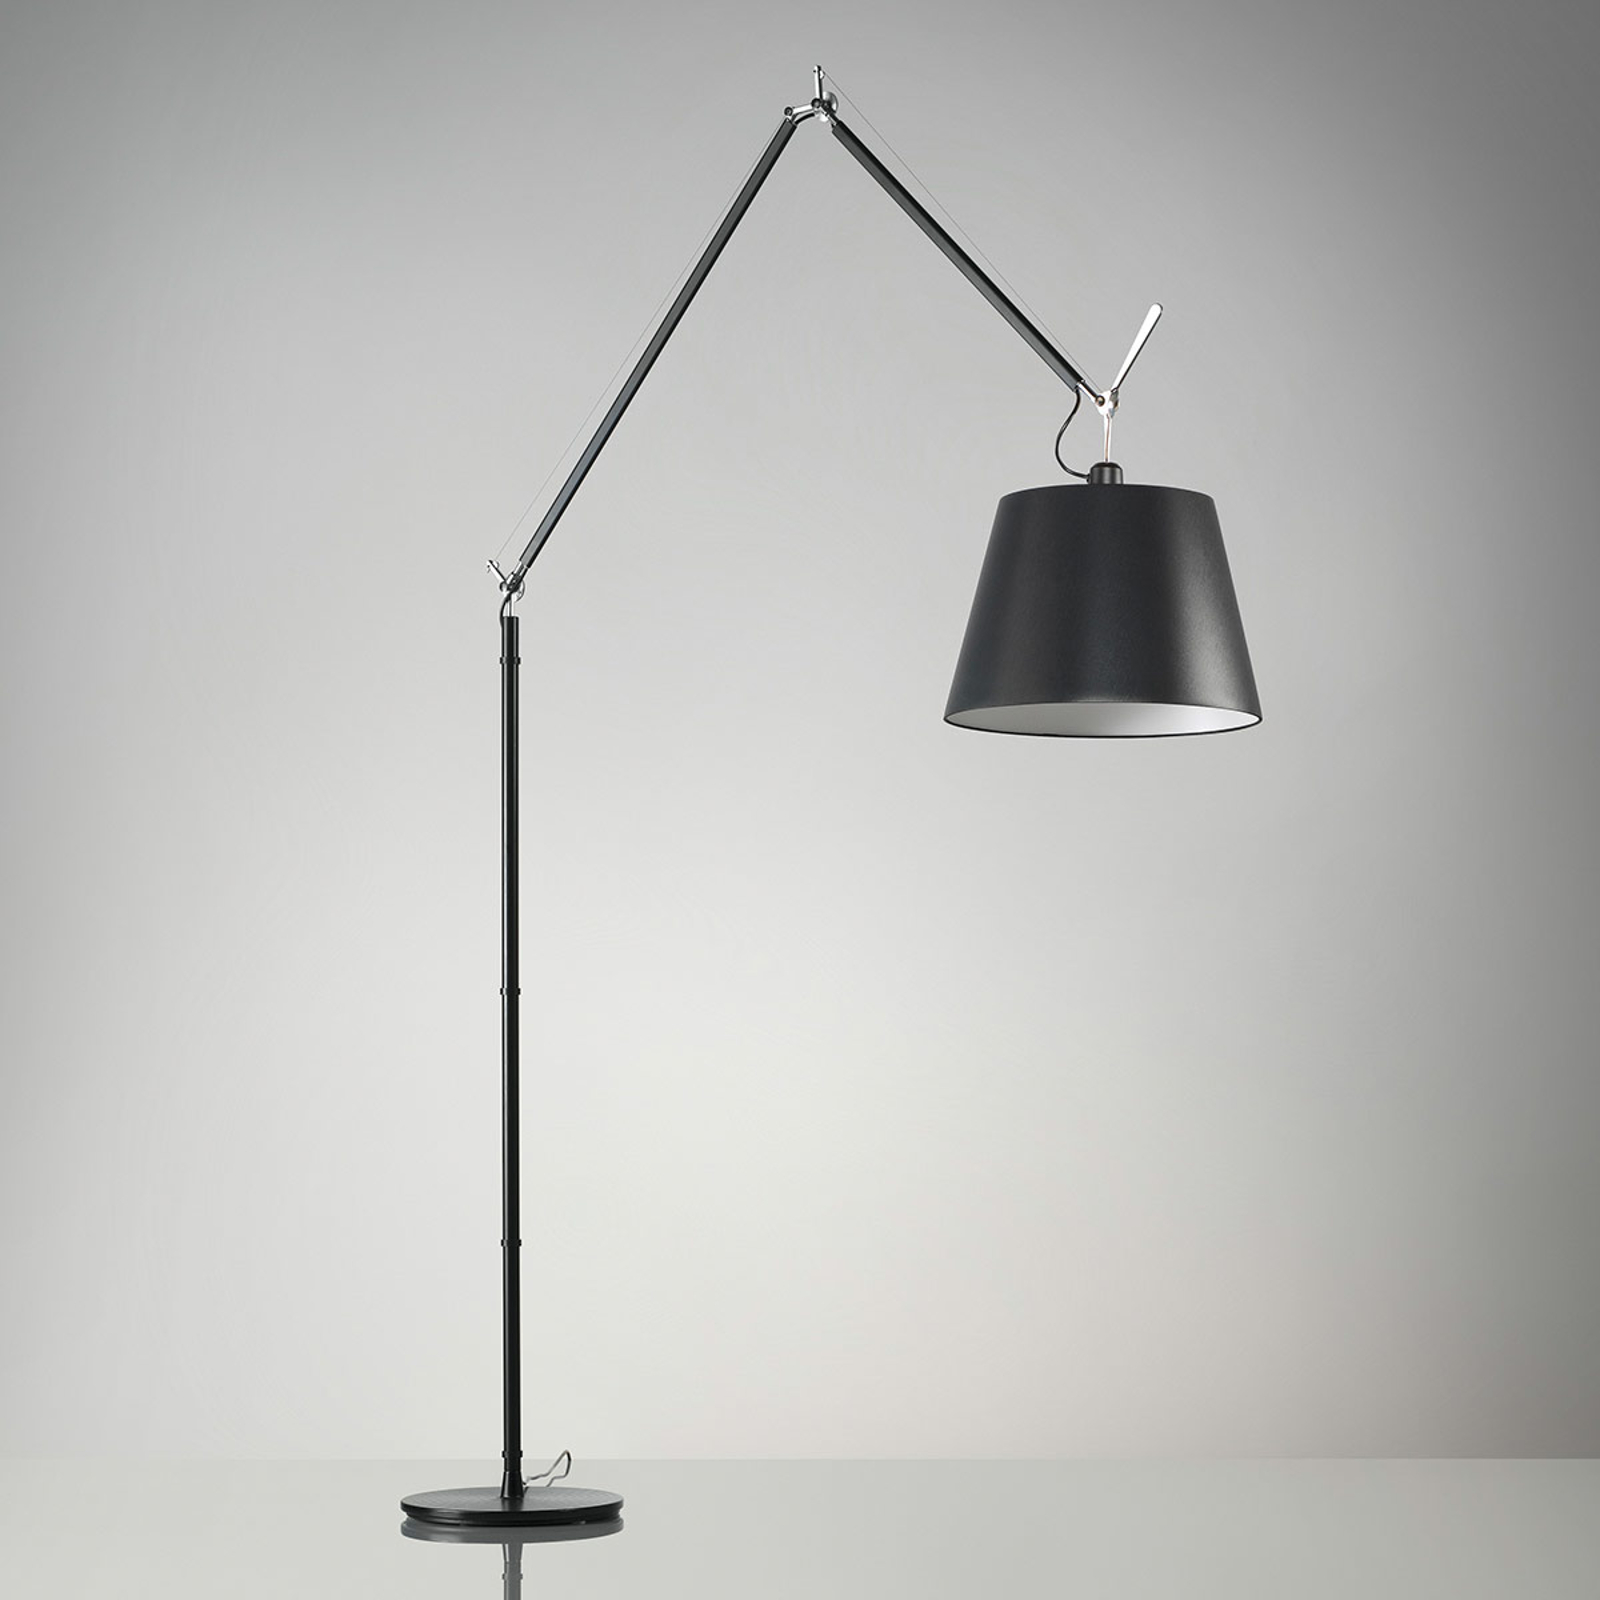 Artemide Tolomeo Mega lampadaire var. 2700K Ø32